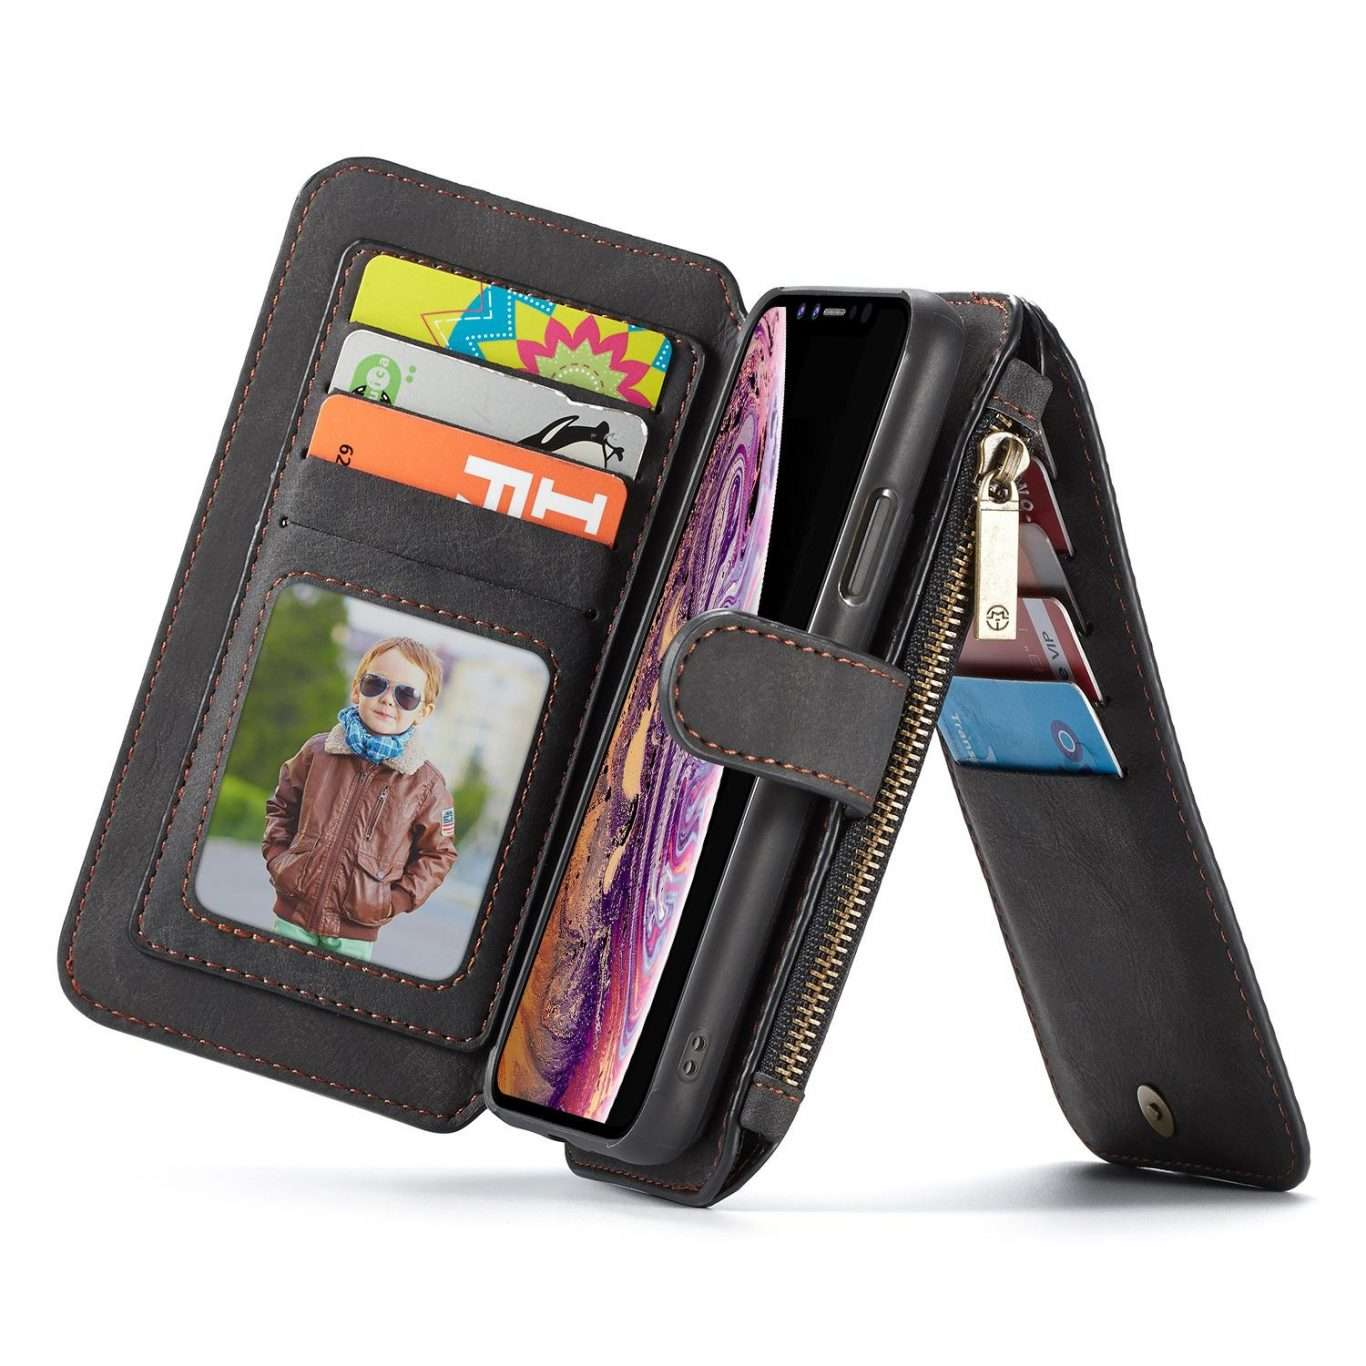 KL-02557 SAMSUNG Phone Leather Case – Black